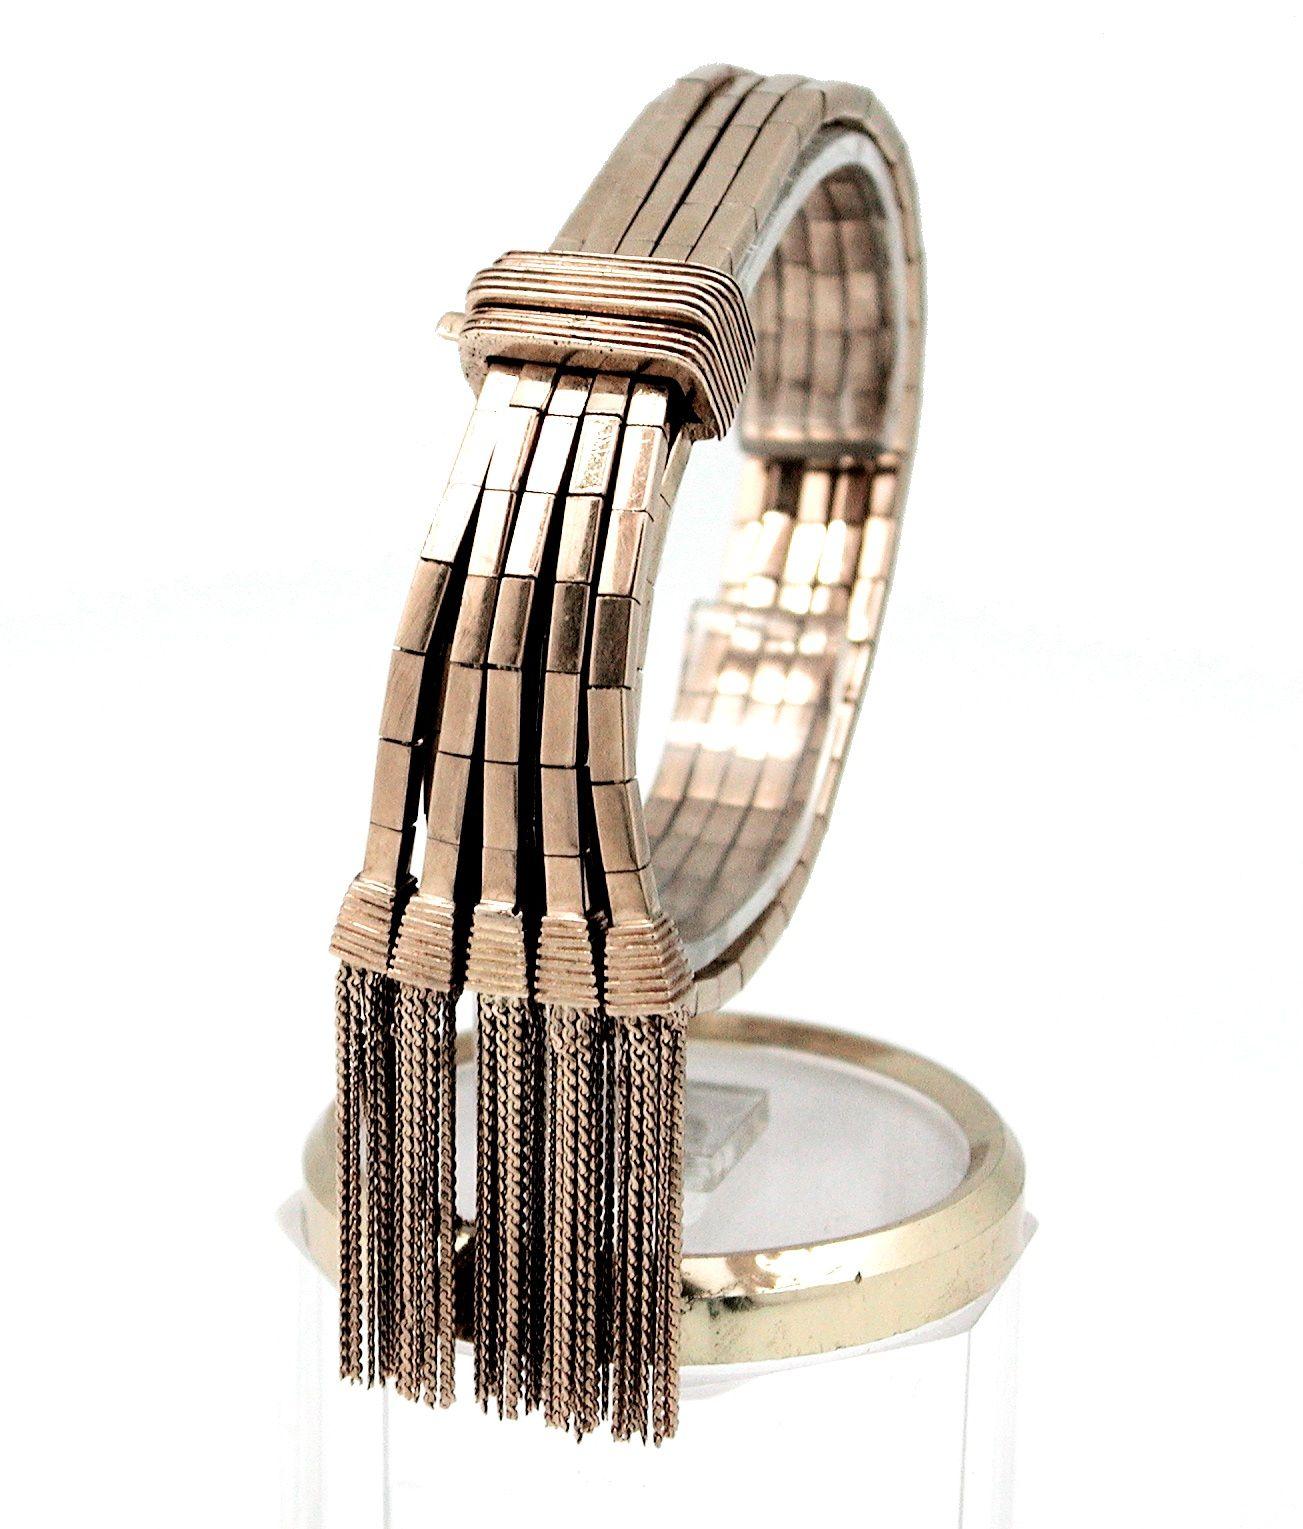 Pulsera articulada con flecos de oro 18 qtes.